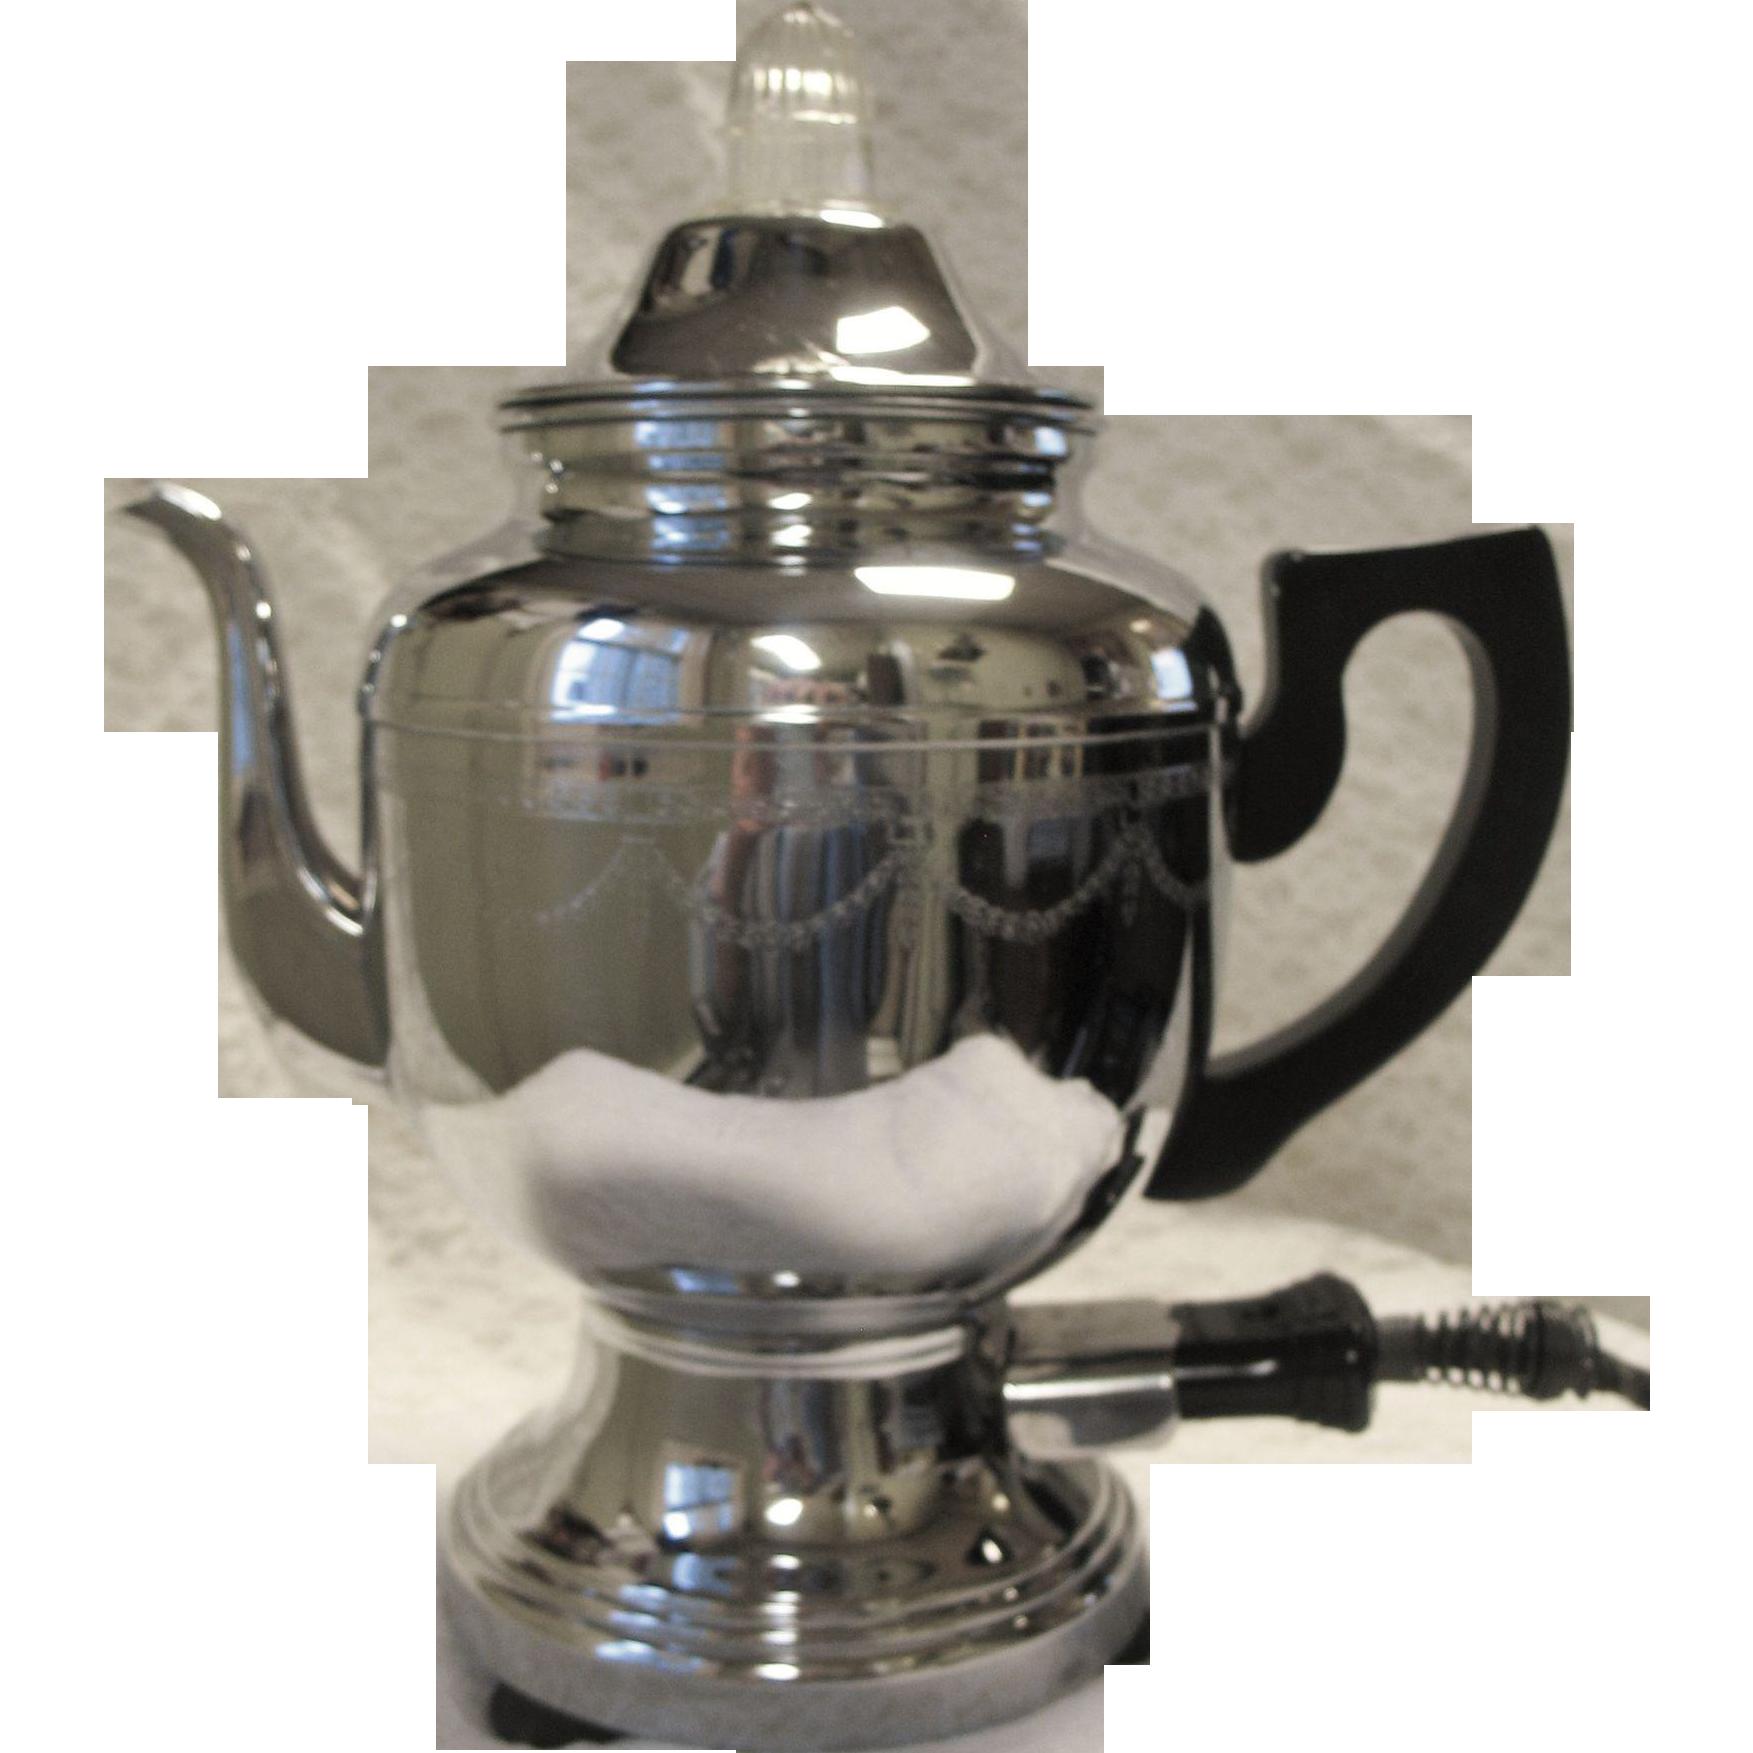 Vintage Farberware Electric Coffee Percolator Pot Art Deco Chrome Etched